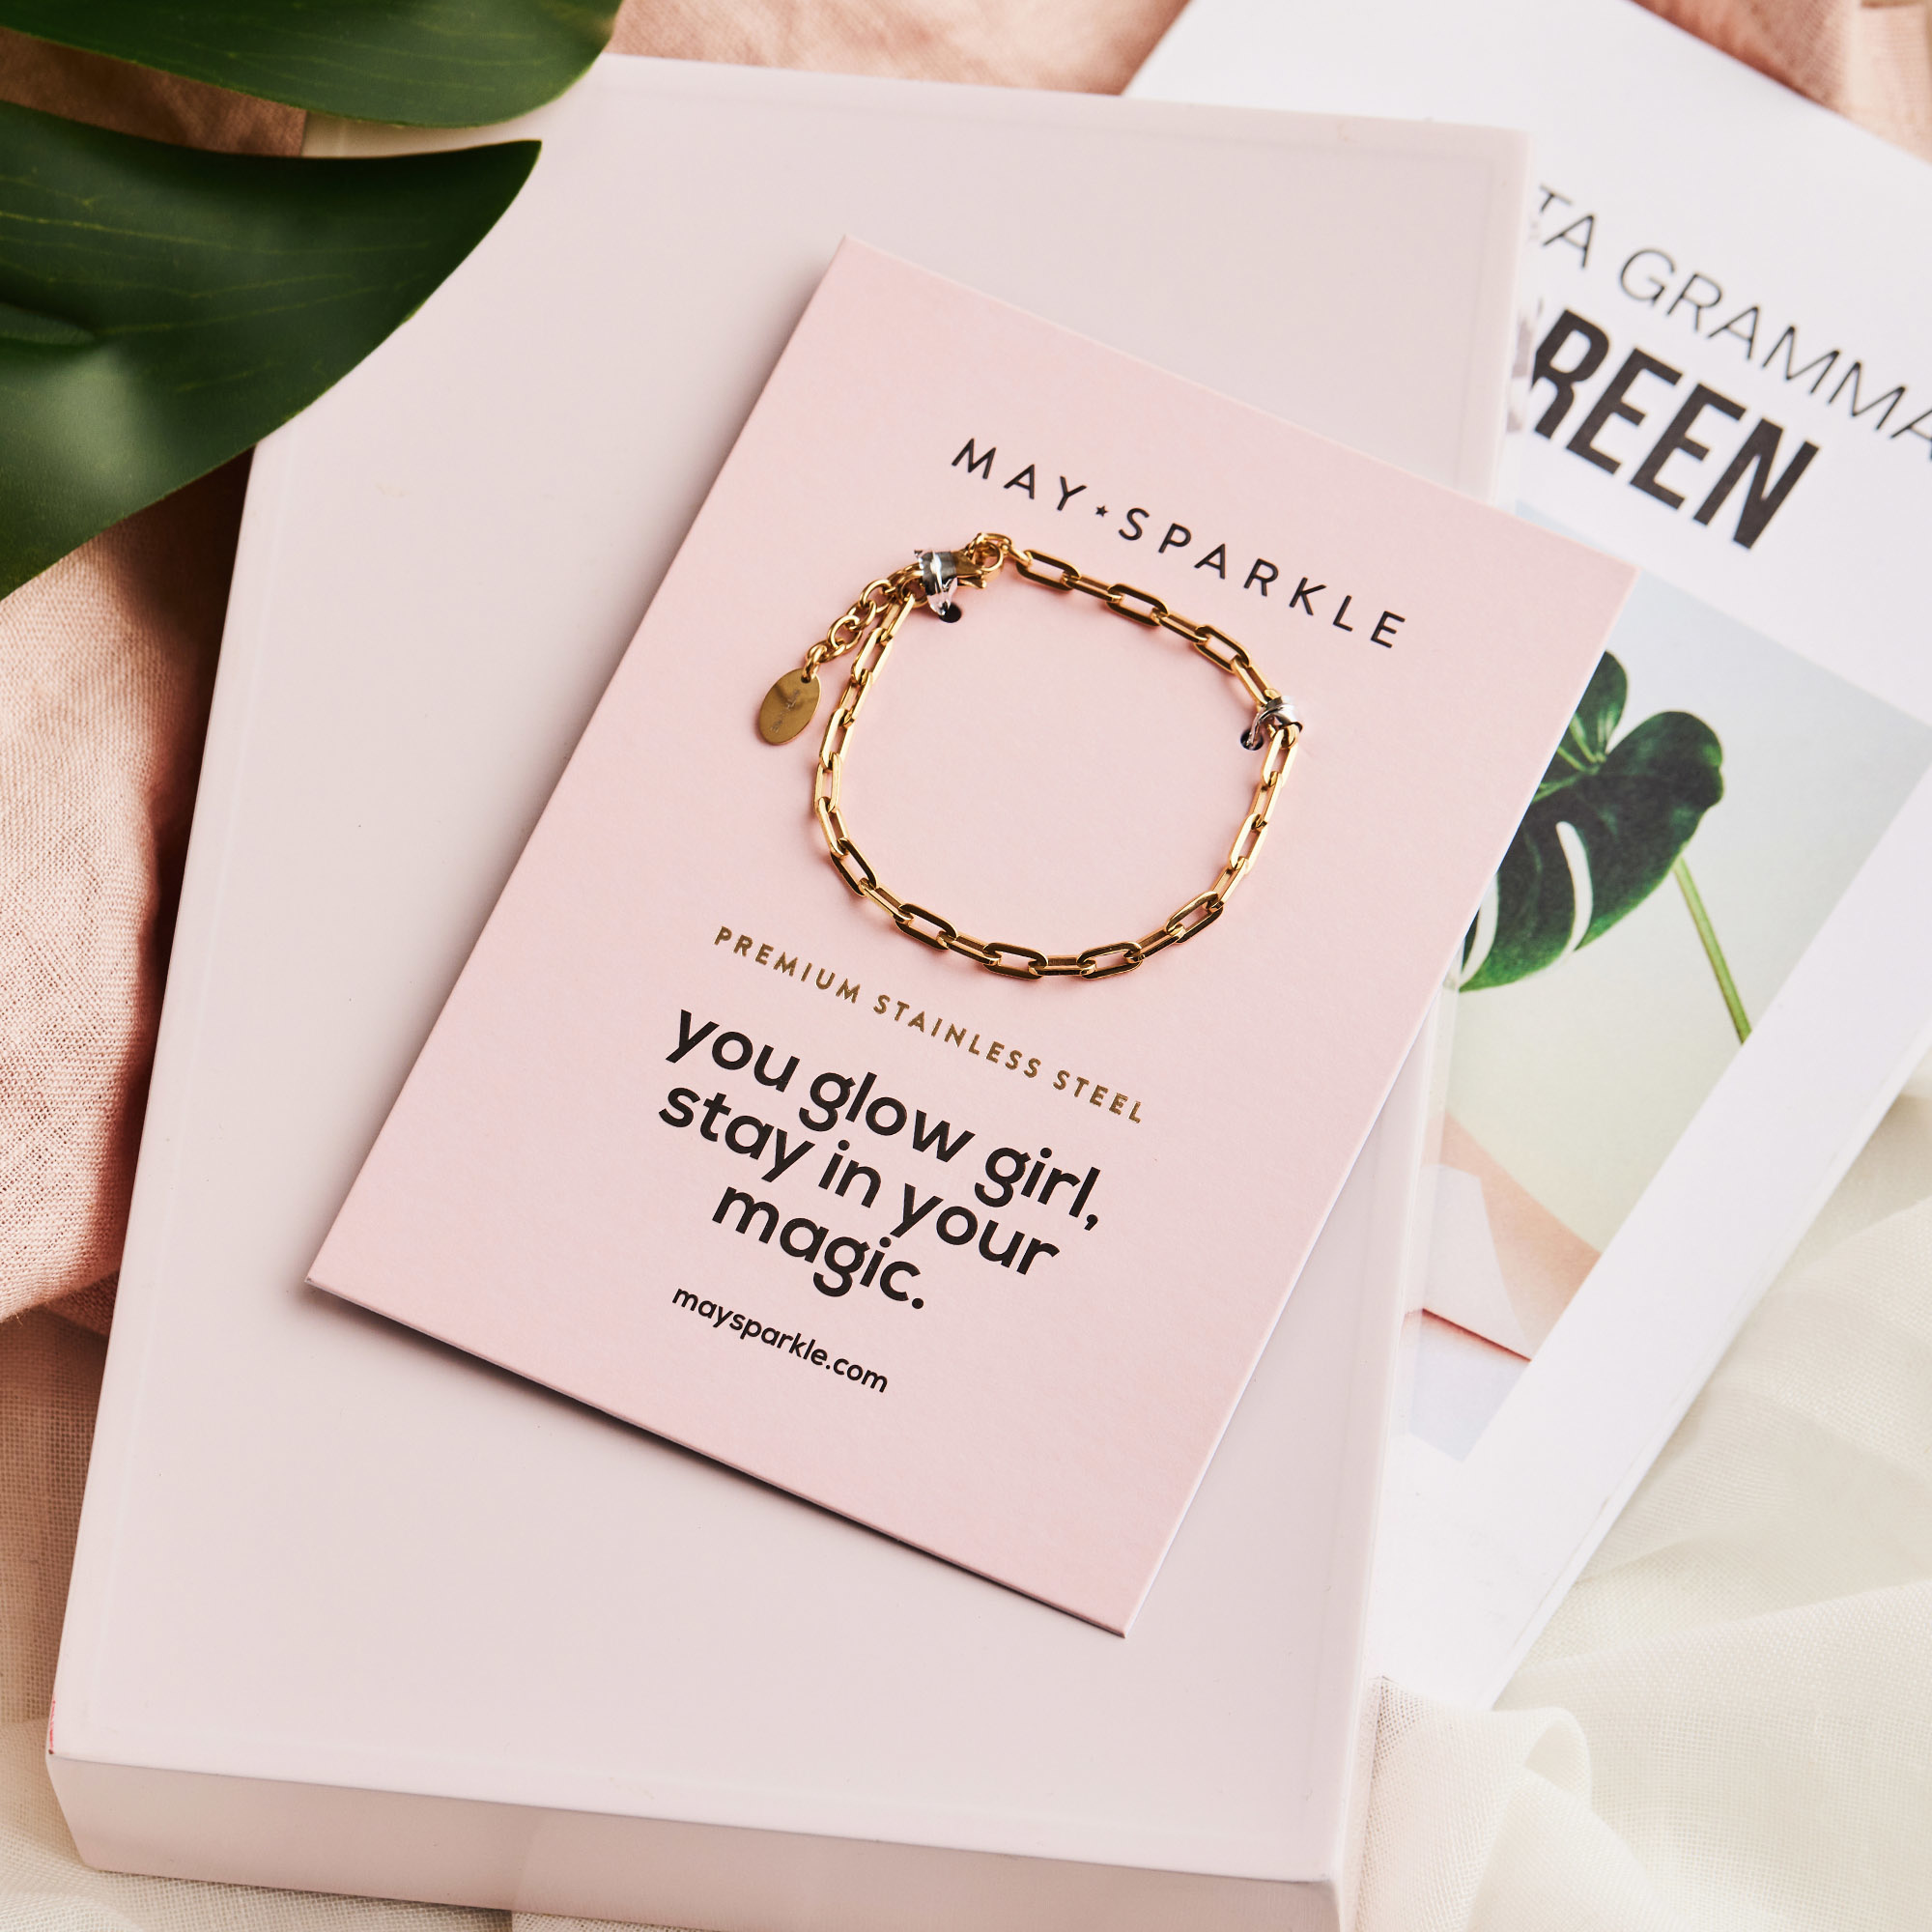 May Sparkle Happiness Amber goudkleurige armband